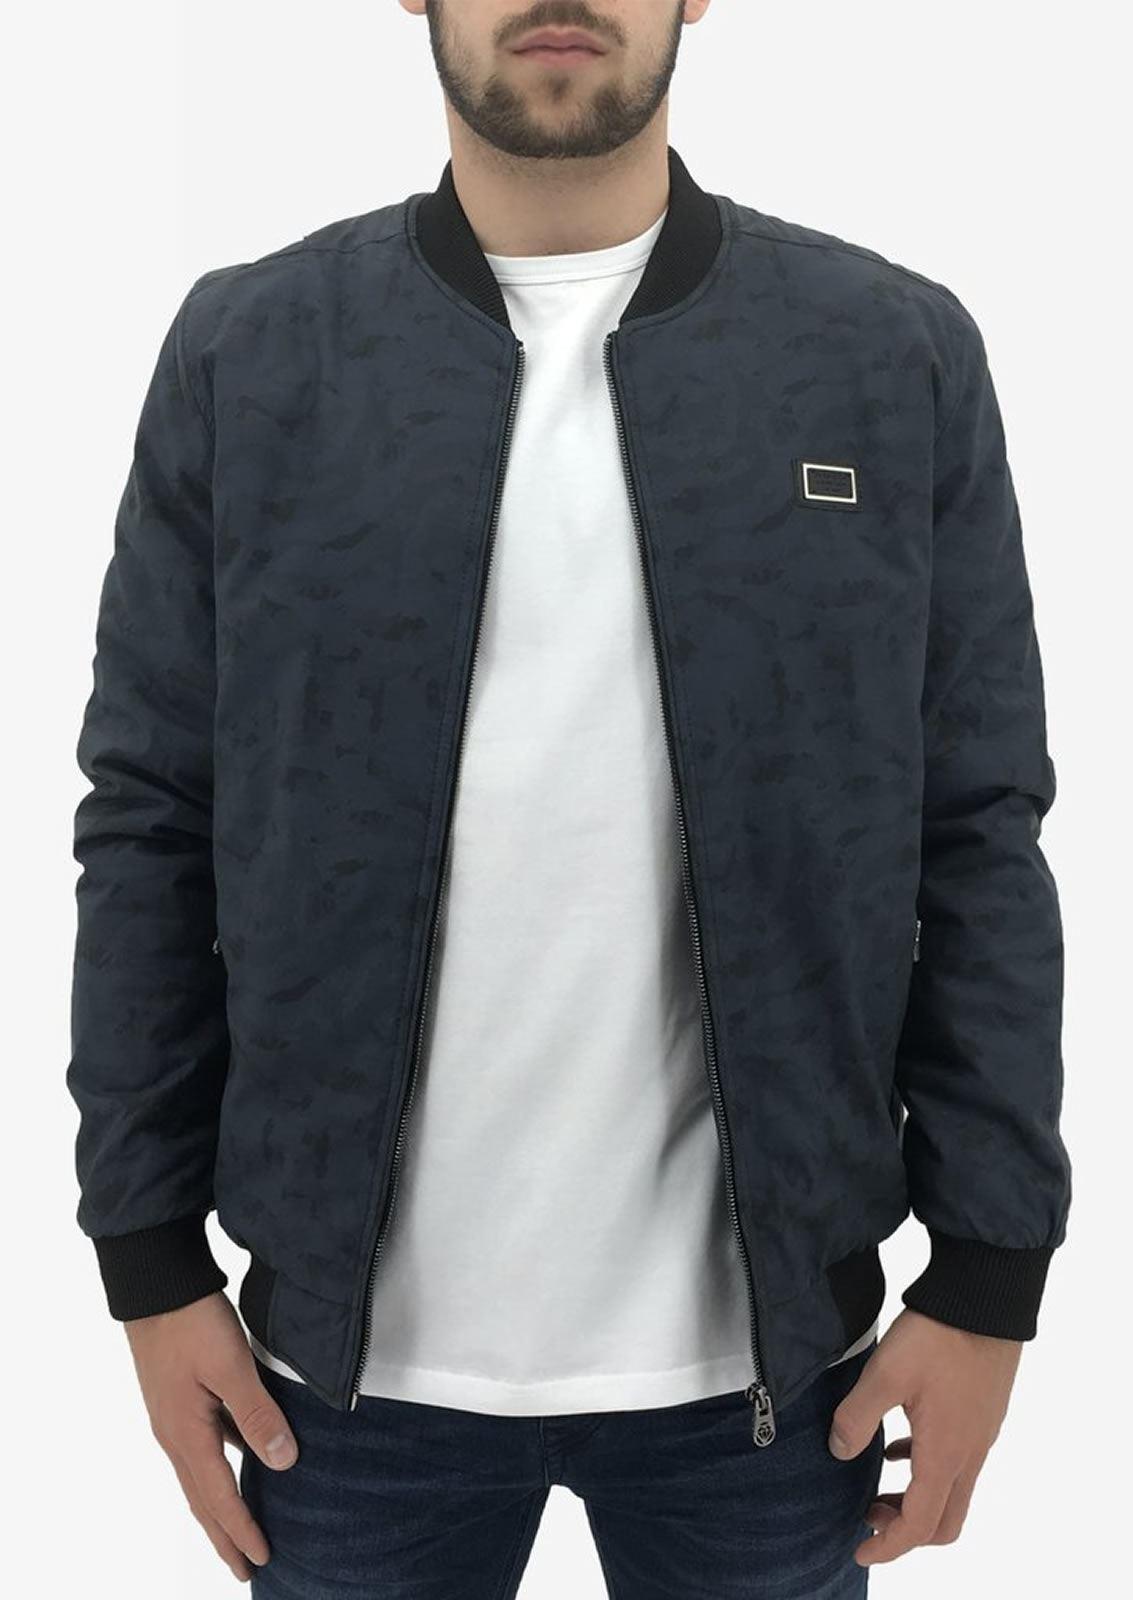 Mens-Jacket-Born-Rich-By-Money-Clothing-Gallium-MA1-Camo-Bomber-Coat